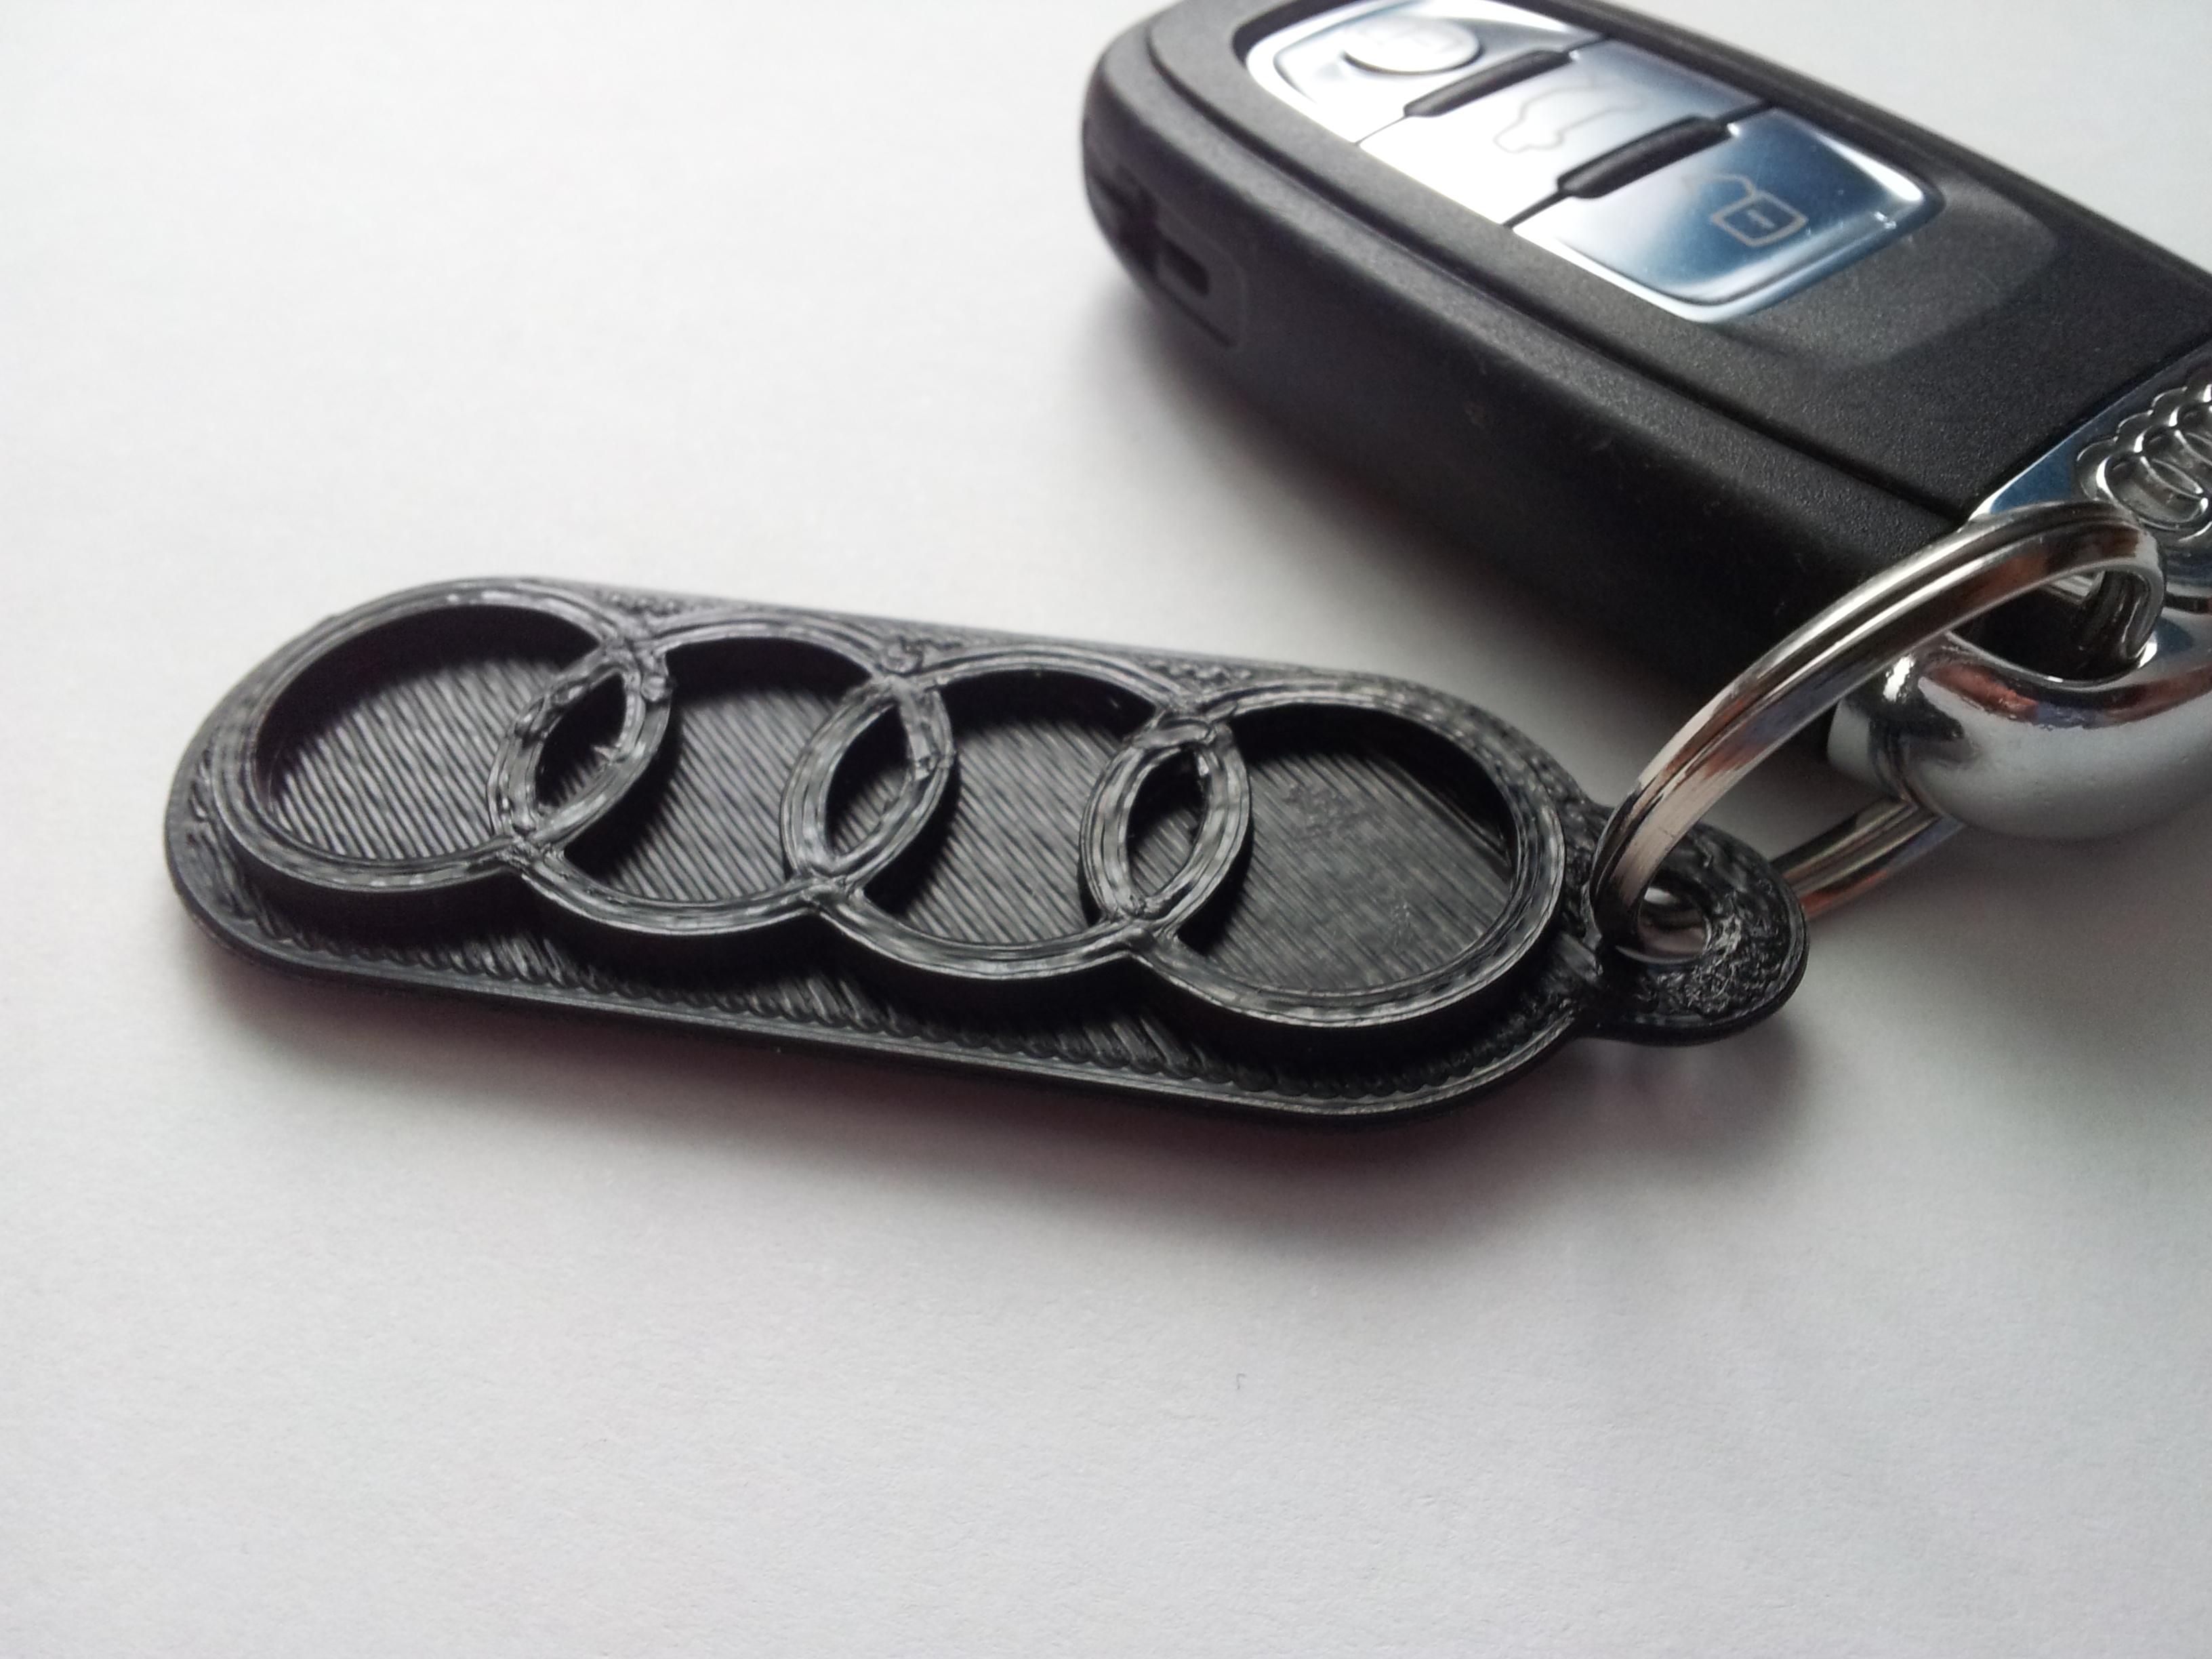 Audi Keychain By Churchi Thingiverse - Audi keychain